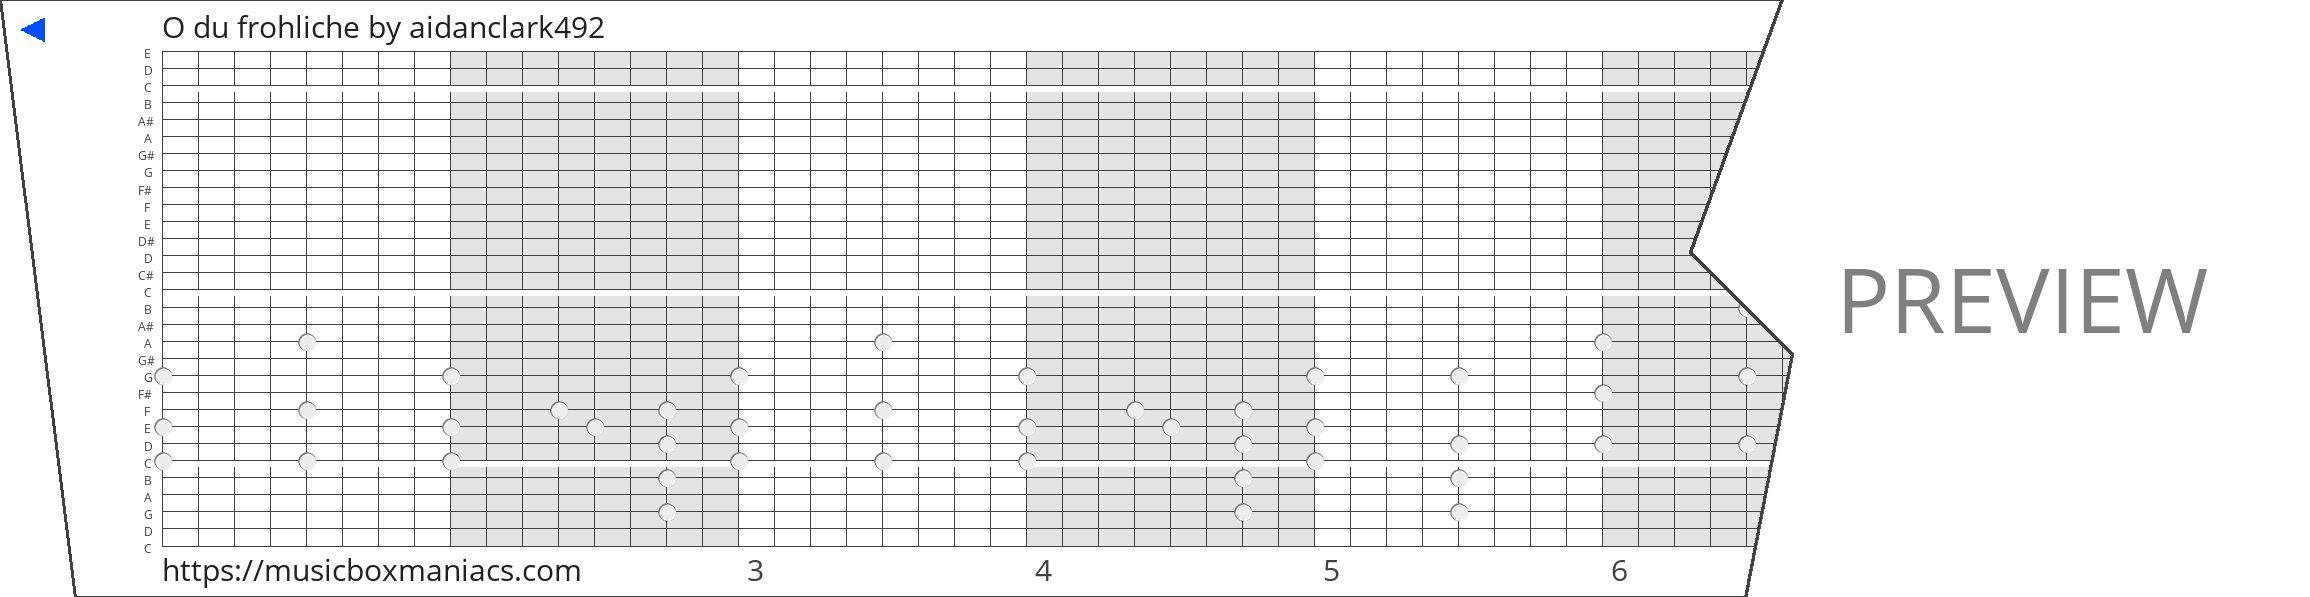 O du frohliche 30 note music box paper strip